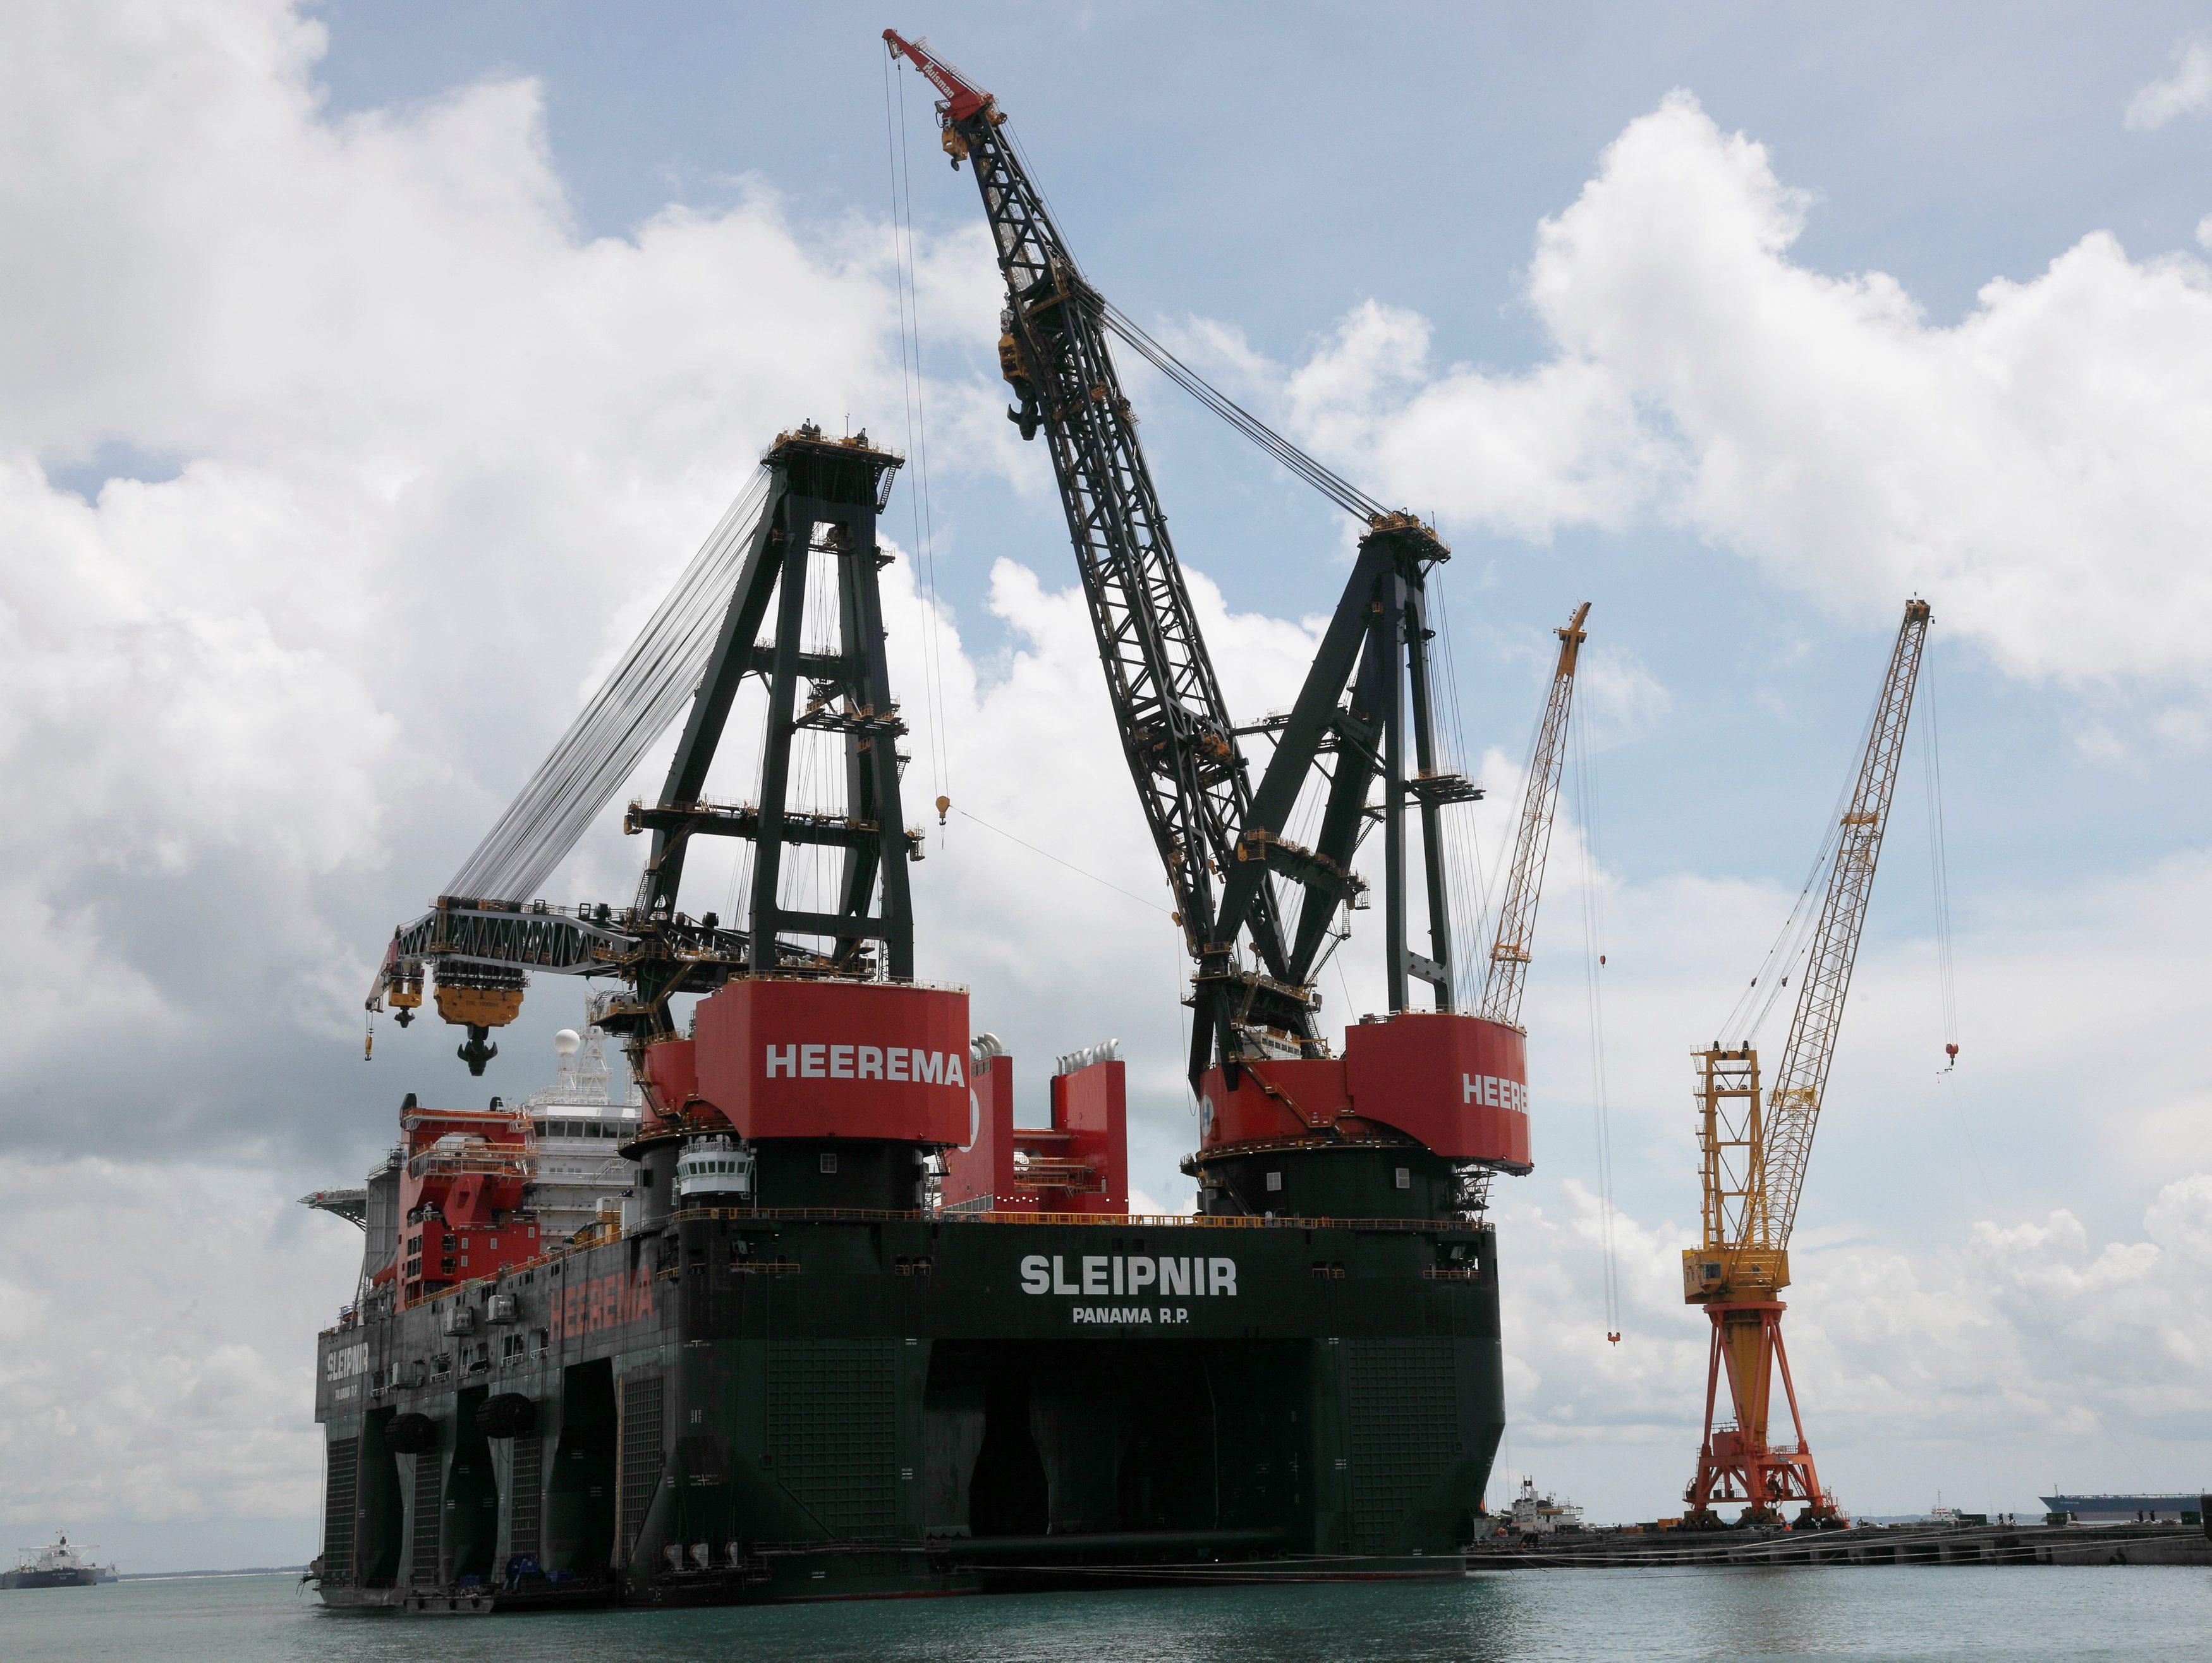 Heerema Marine Contractors' Sleipnir, the world's largest semi-submersible crane vessel, sits in the Sembcorp Marine shipyard in Singapore